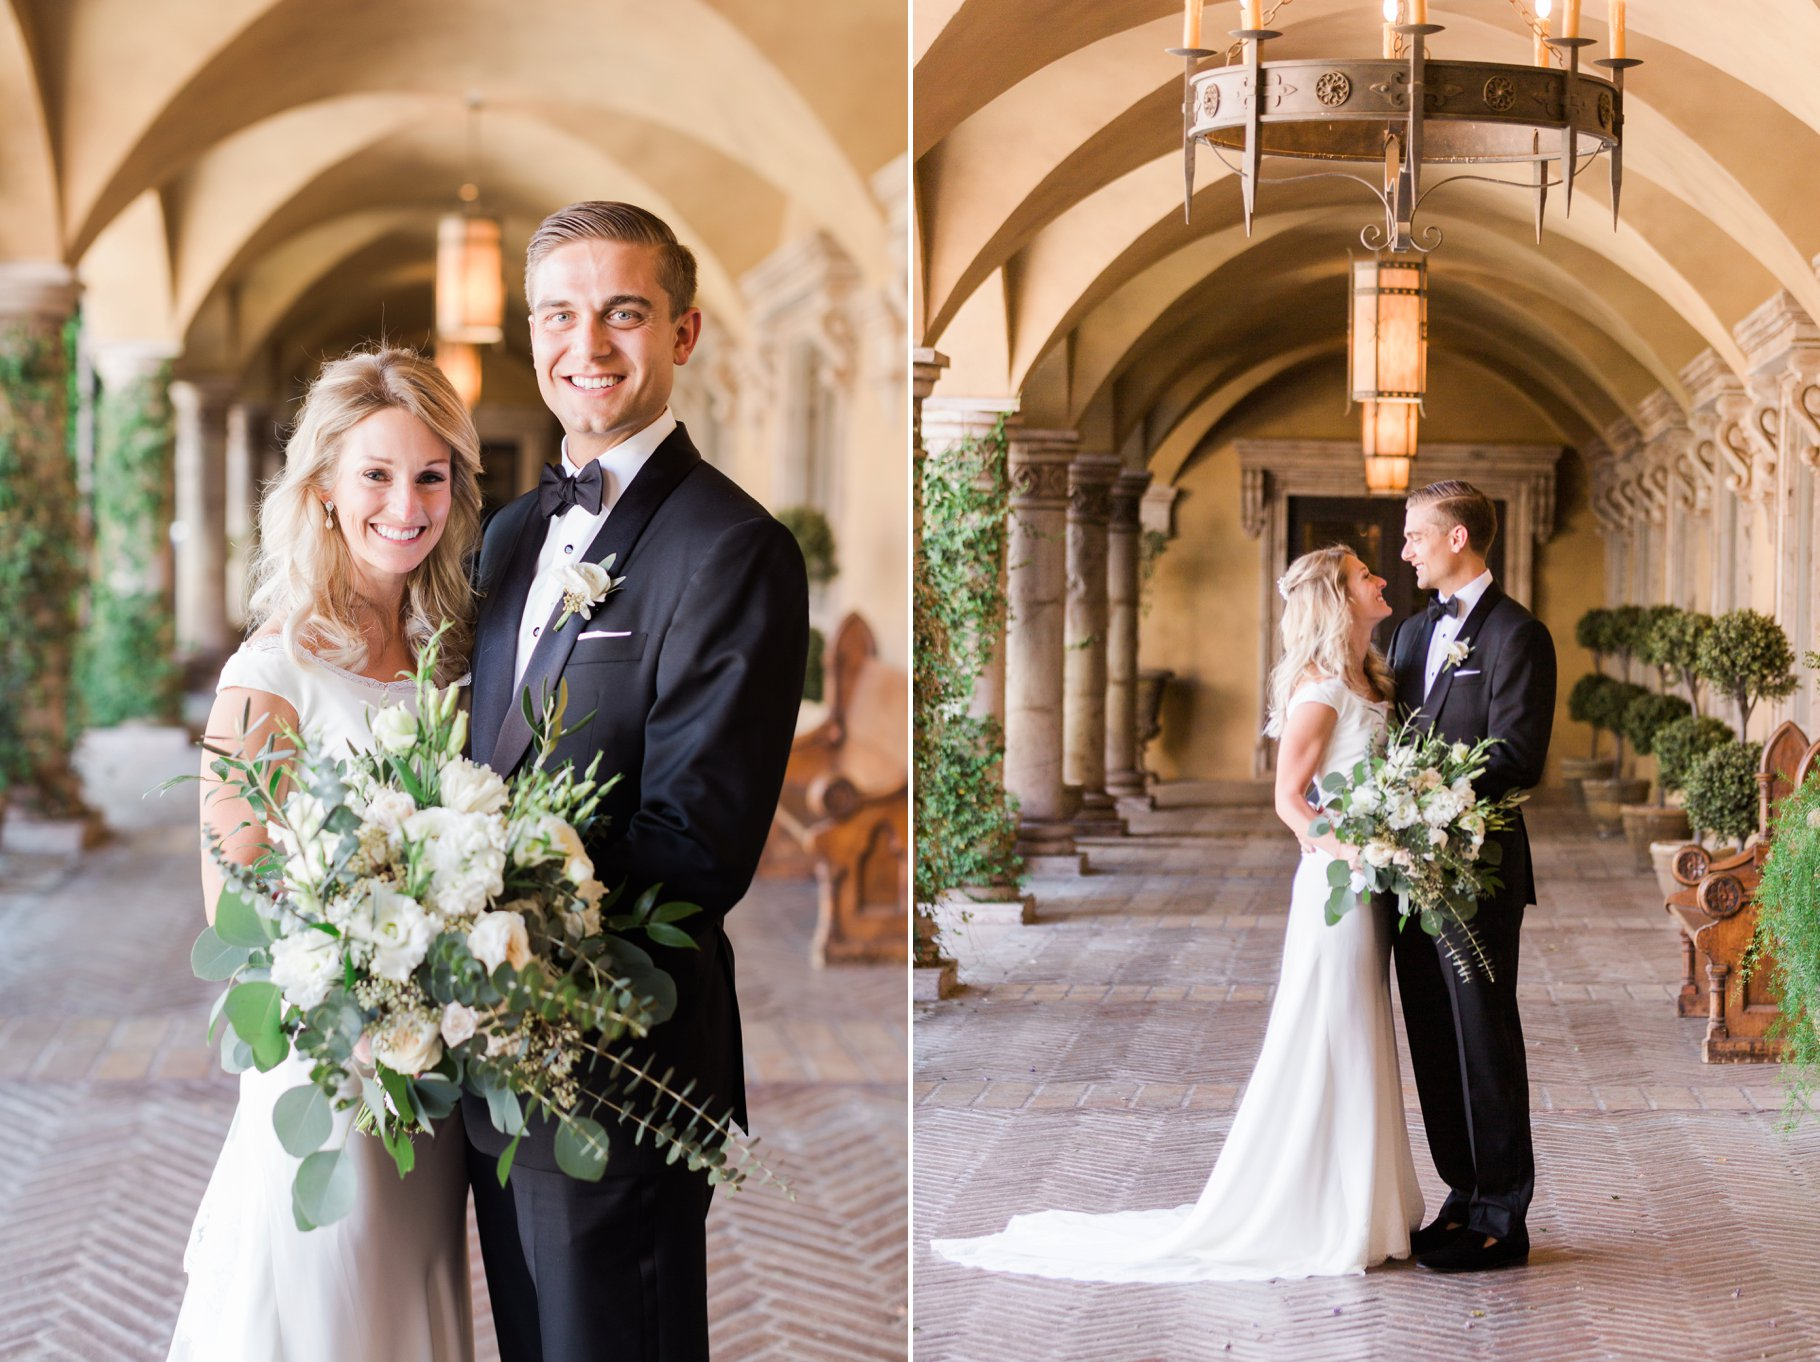 villa siena wedding-026_GRETCHEN WAKEMAN PHOTOGRAPHY.jpg